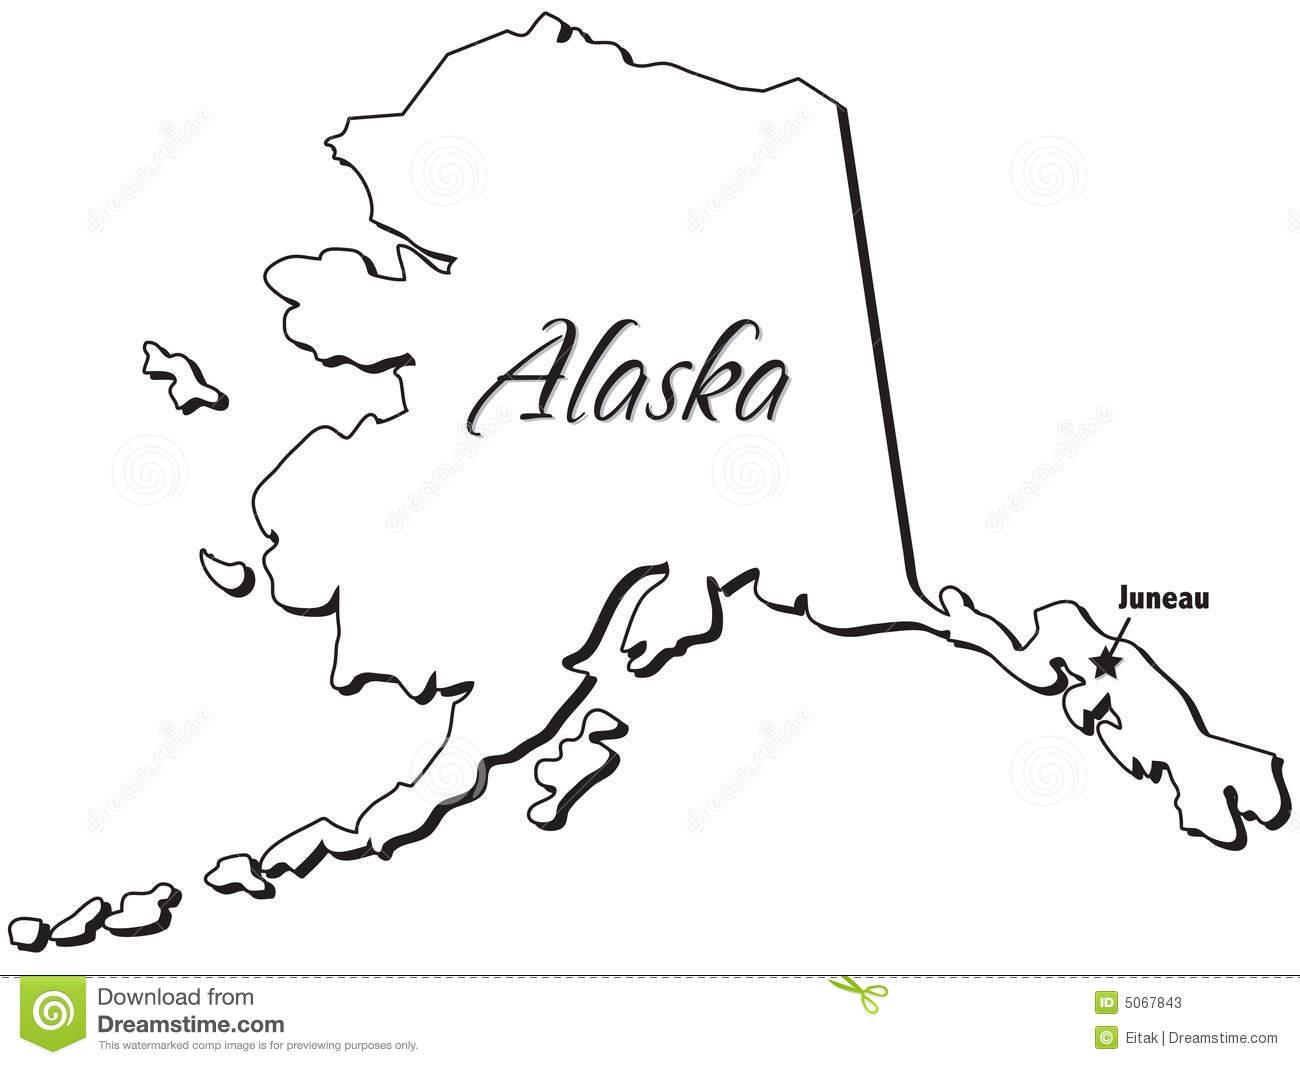 Alaska map clip art clipart Alaska clipart outline - ClipartFest clipart